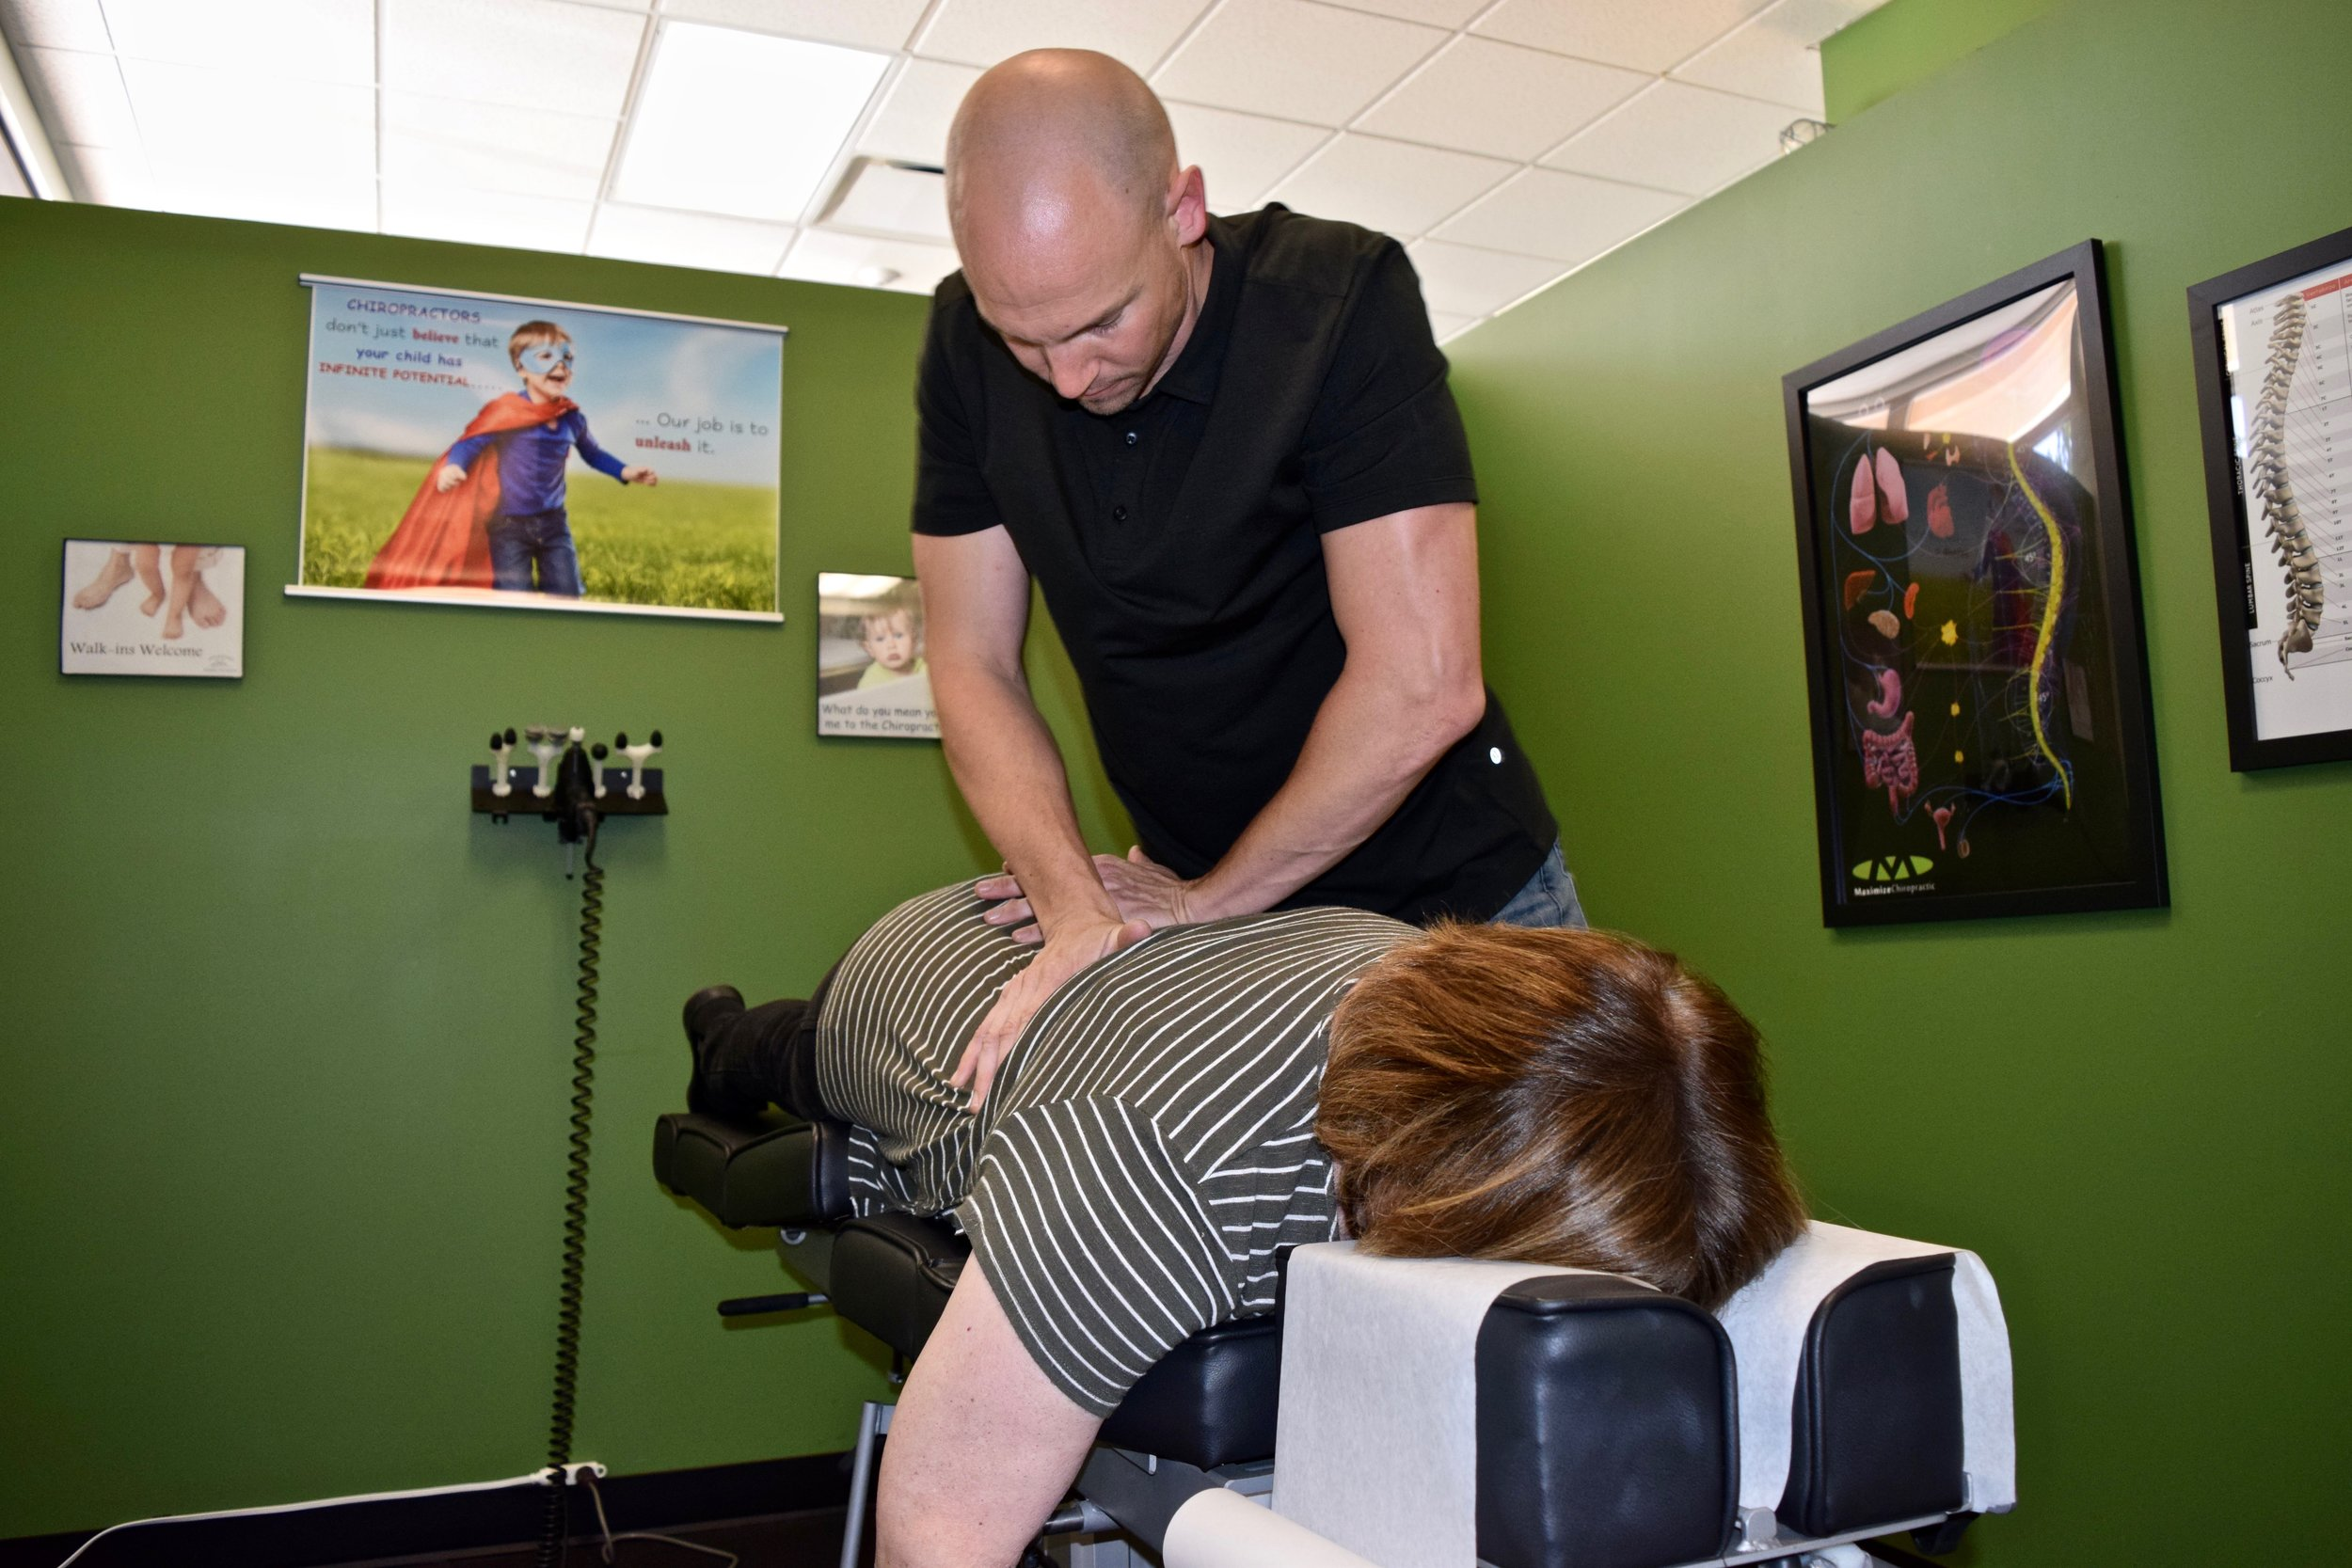 Max Chiro Dr TIm Hand Adjust Female Patient  2.jpg